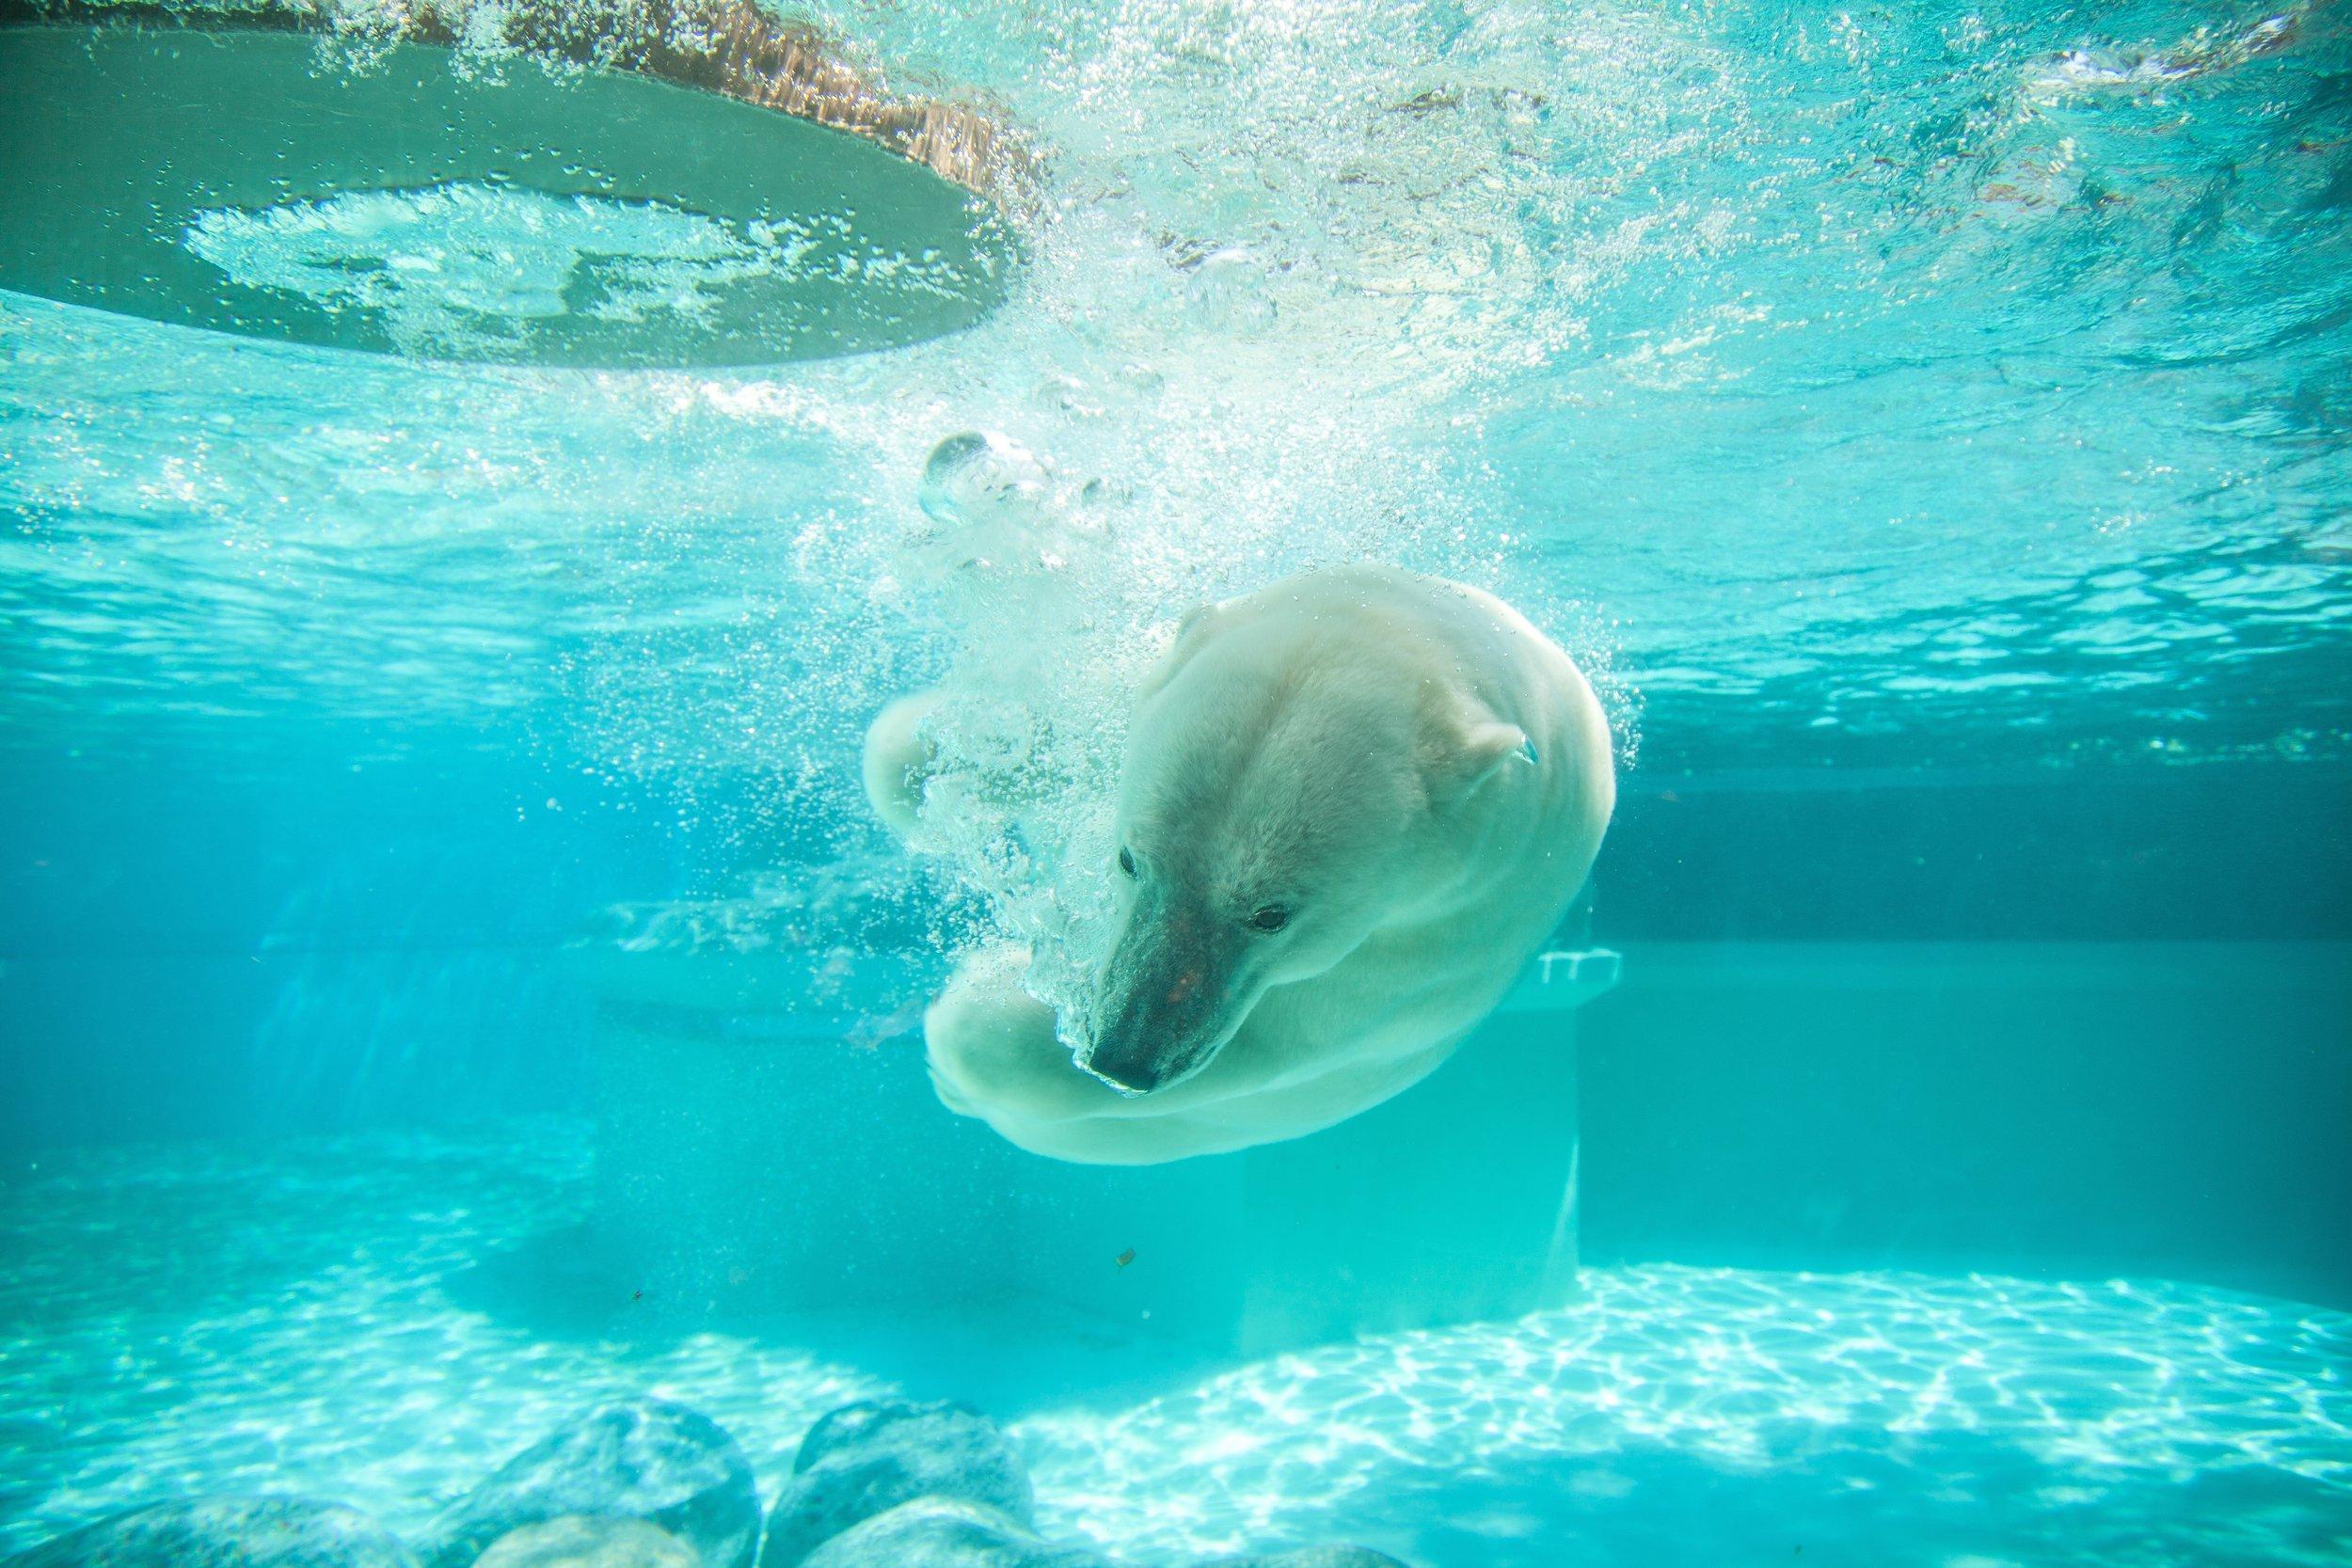 matthew mazzei lincolin park zoo chicago Up cW Polar Bear Swim.jpg